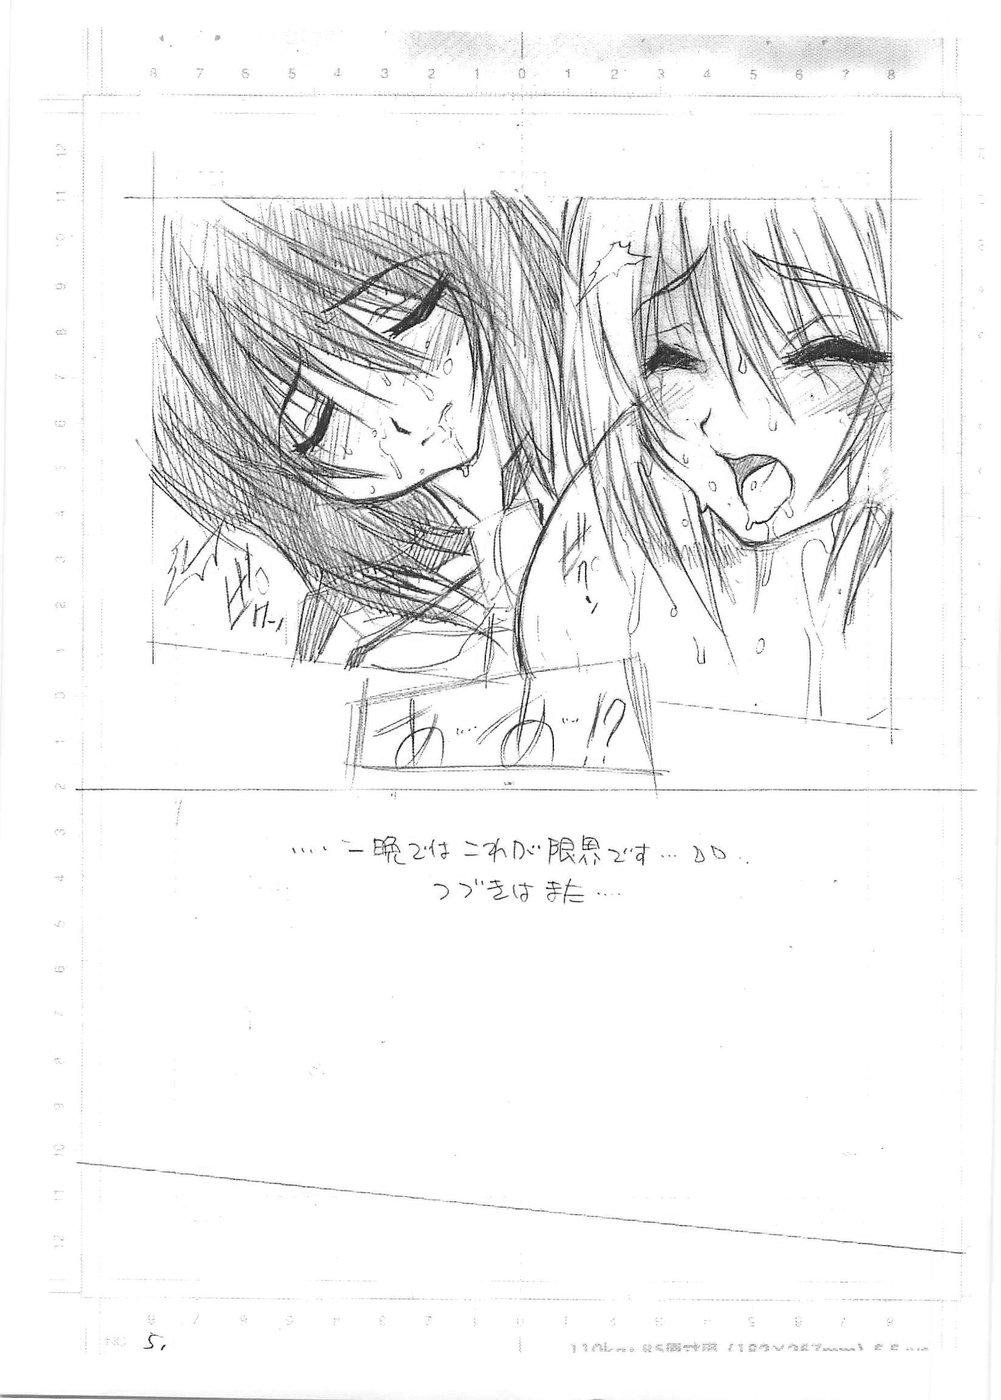 (Futaket 2) [Escargot Club (Juubaori Mashumaro)] Byubyubyu-byu Byu-byubyu!! (Bobobo-bo Bo-bobo) 10